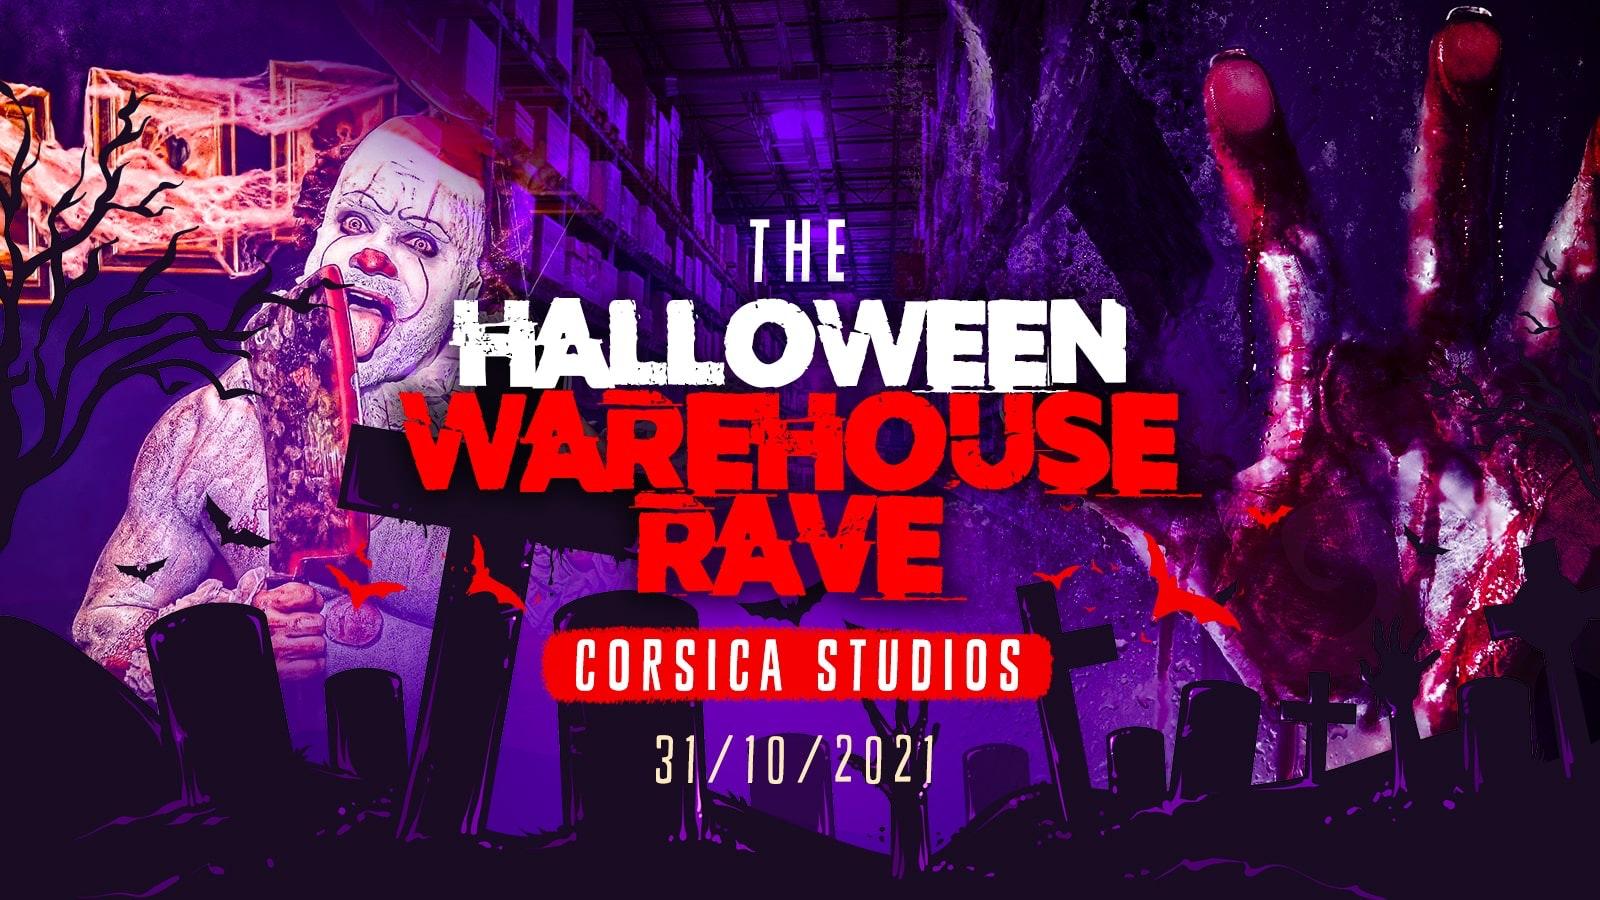 The Haunted Warehouse Rave @ Corsica Studios | London Halloween 2021